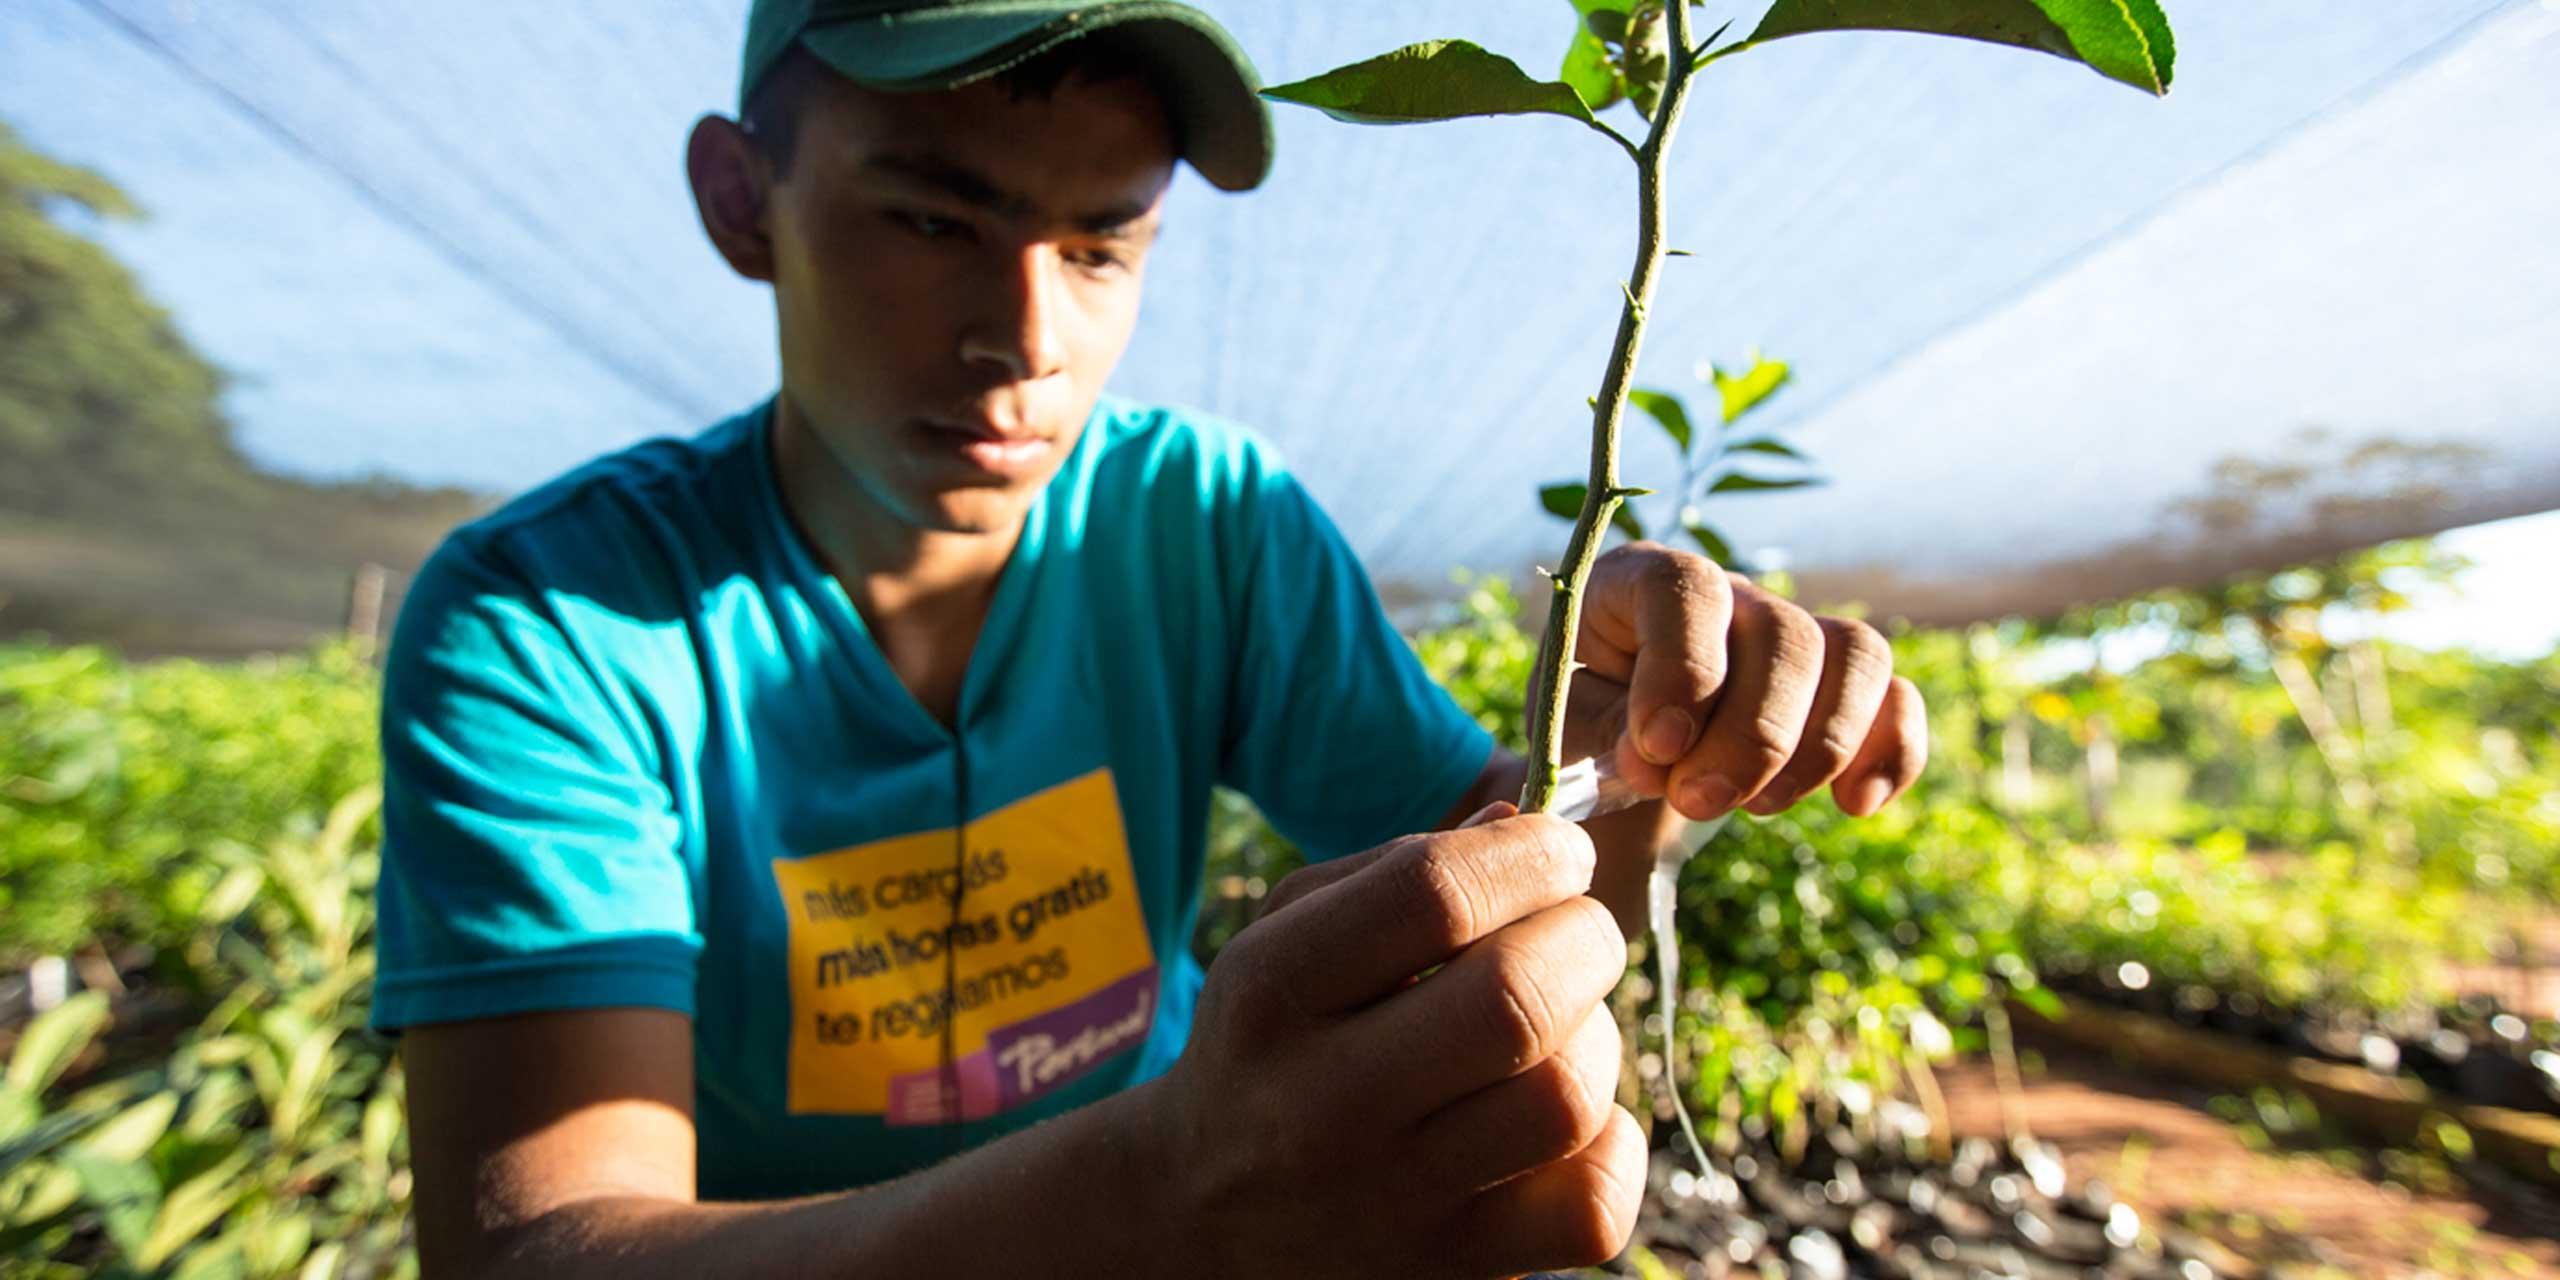 http://skollworldforumorg.c.presscdn.com/wp-content/uploads/2014/04/fundacion-paraguaya-sl4.jpg